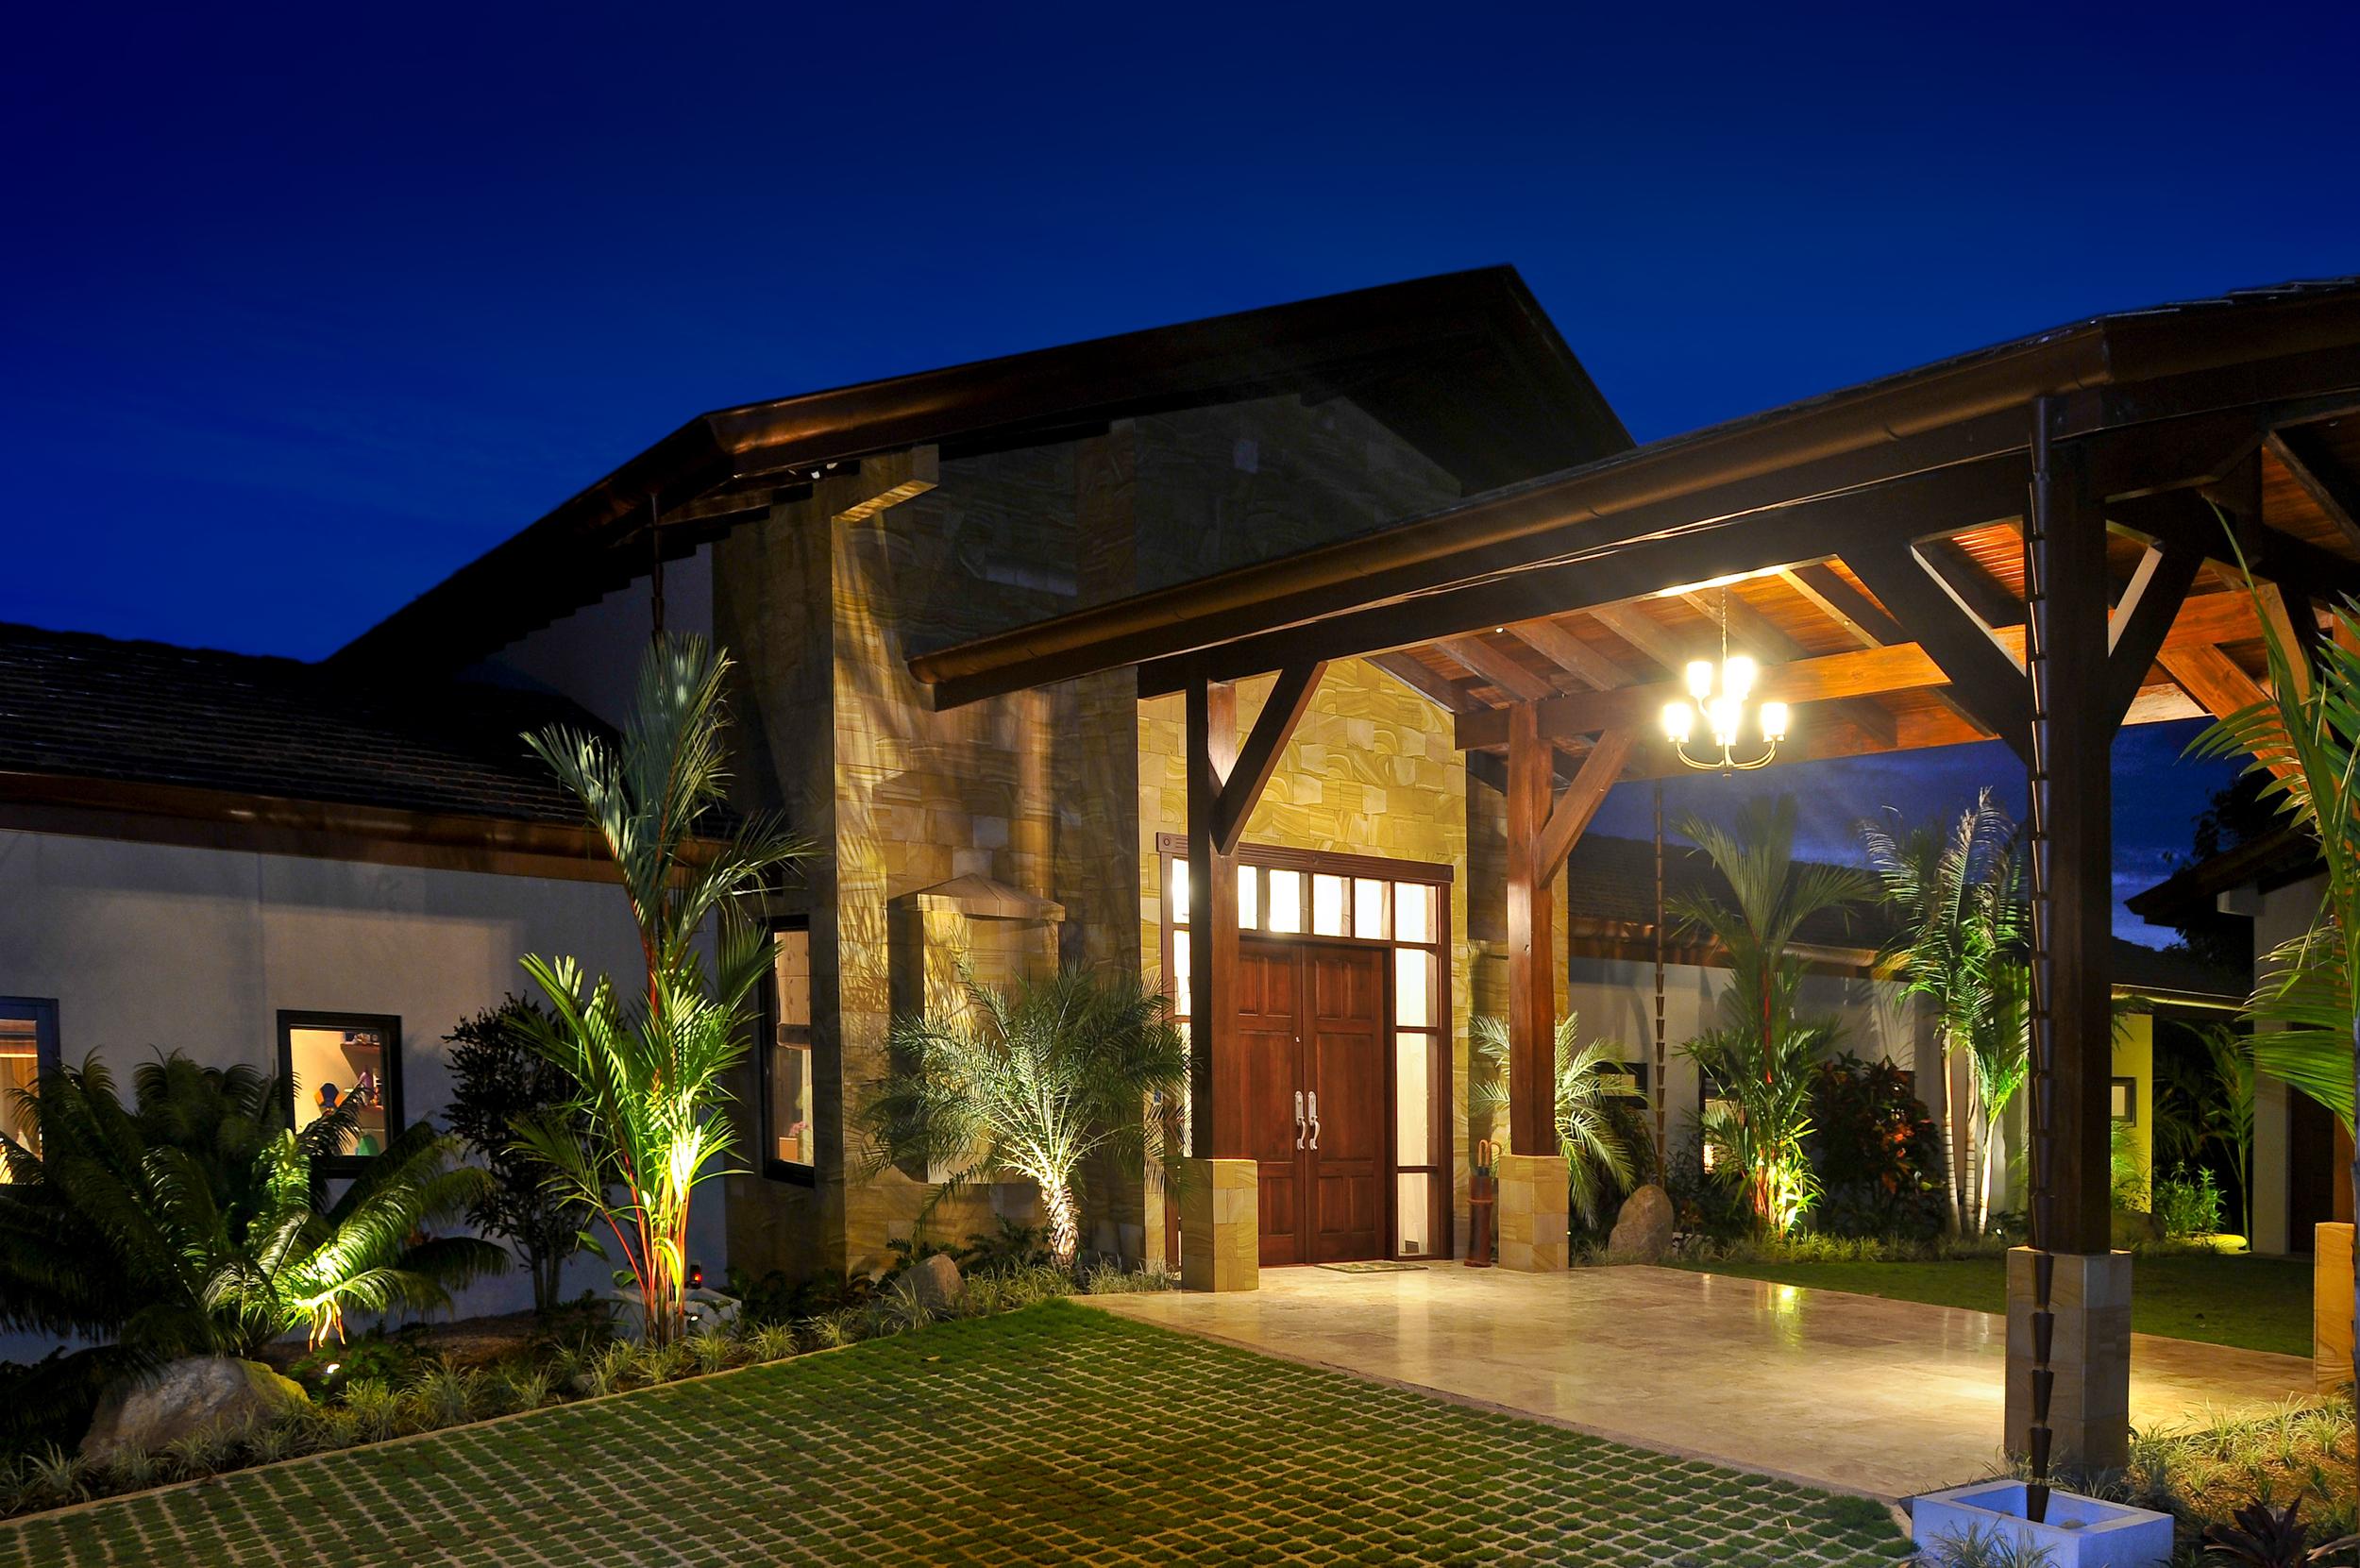 flex5-yoga-retreat-costa-rica-villa-front-entrance.jpg